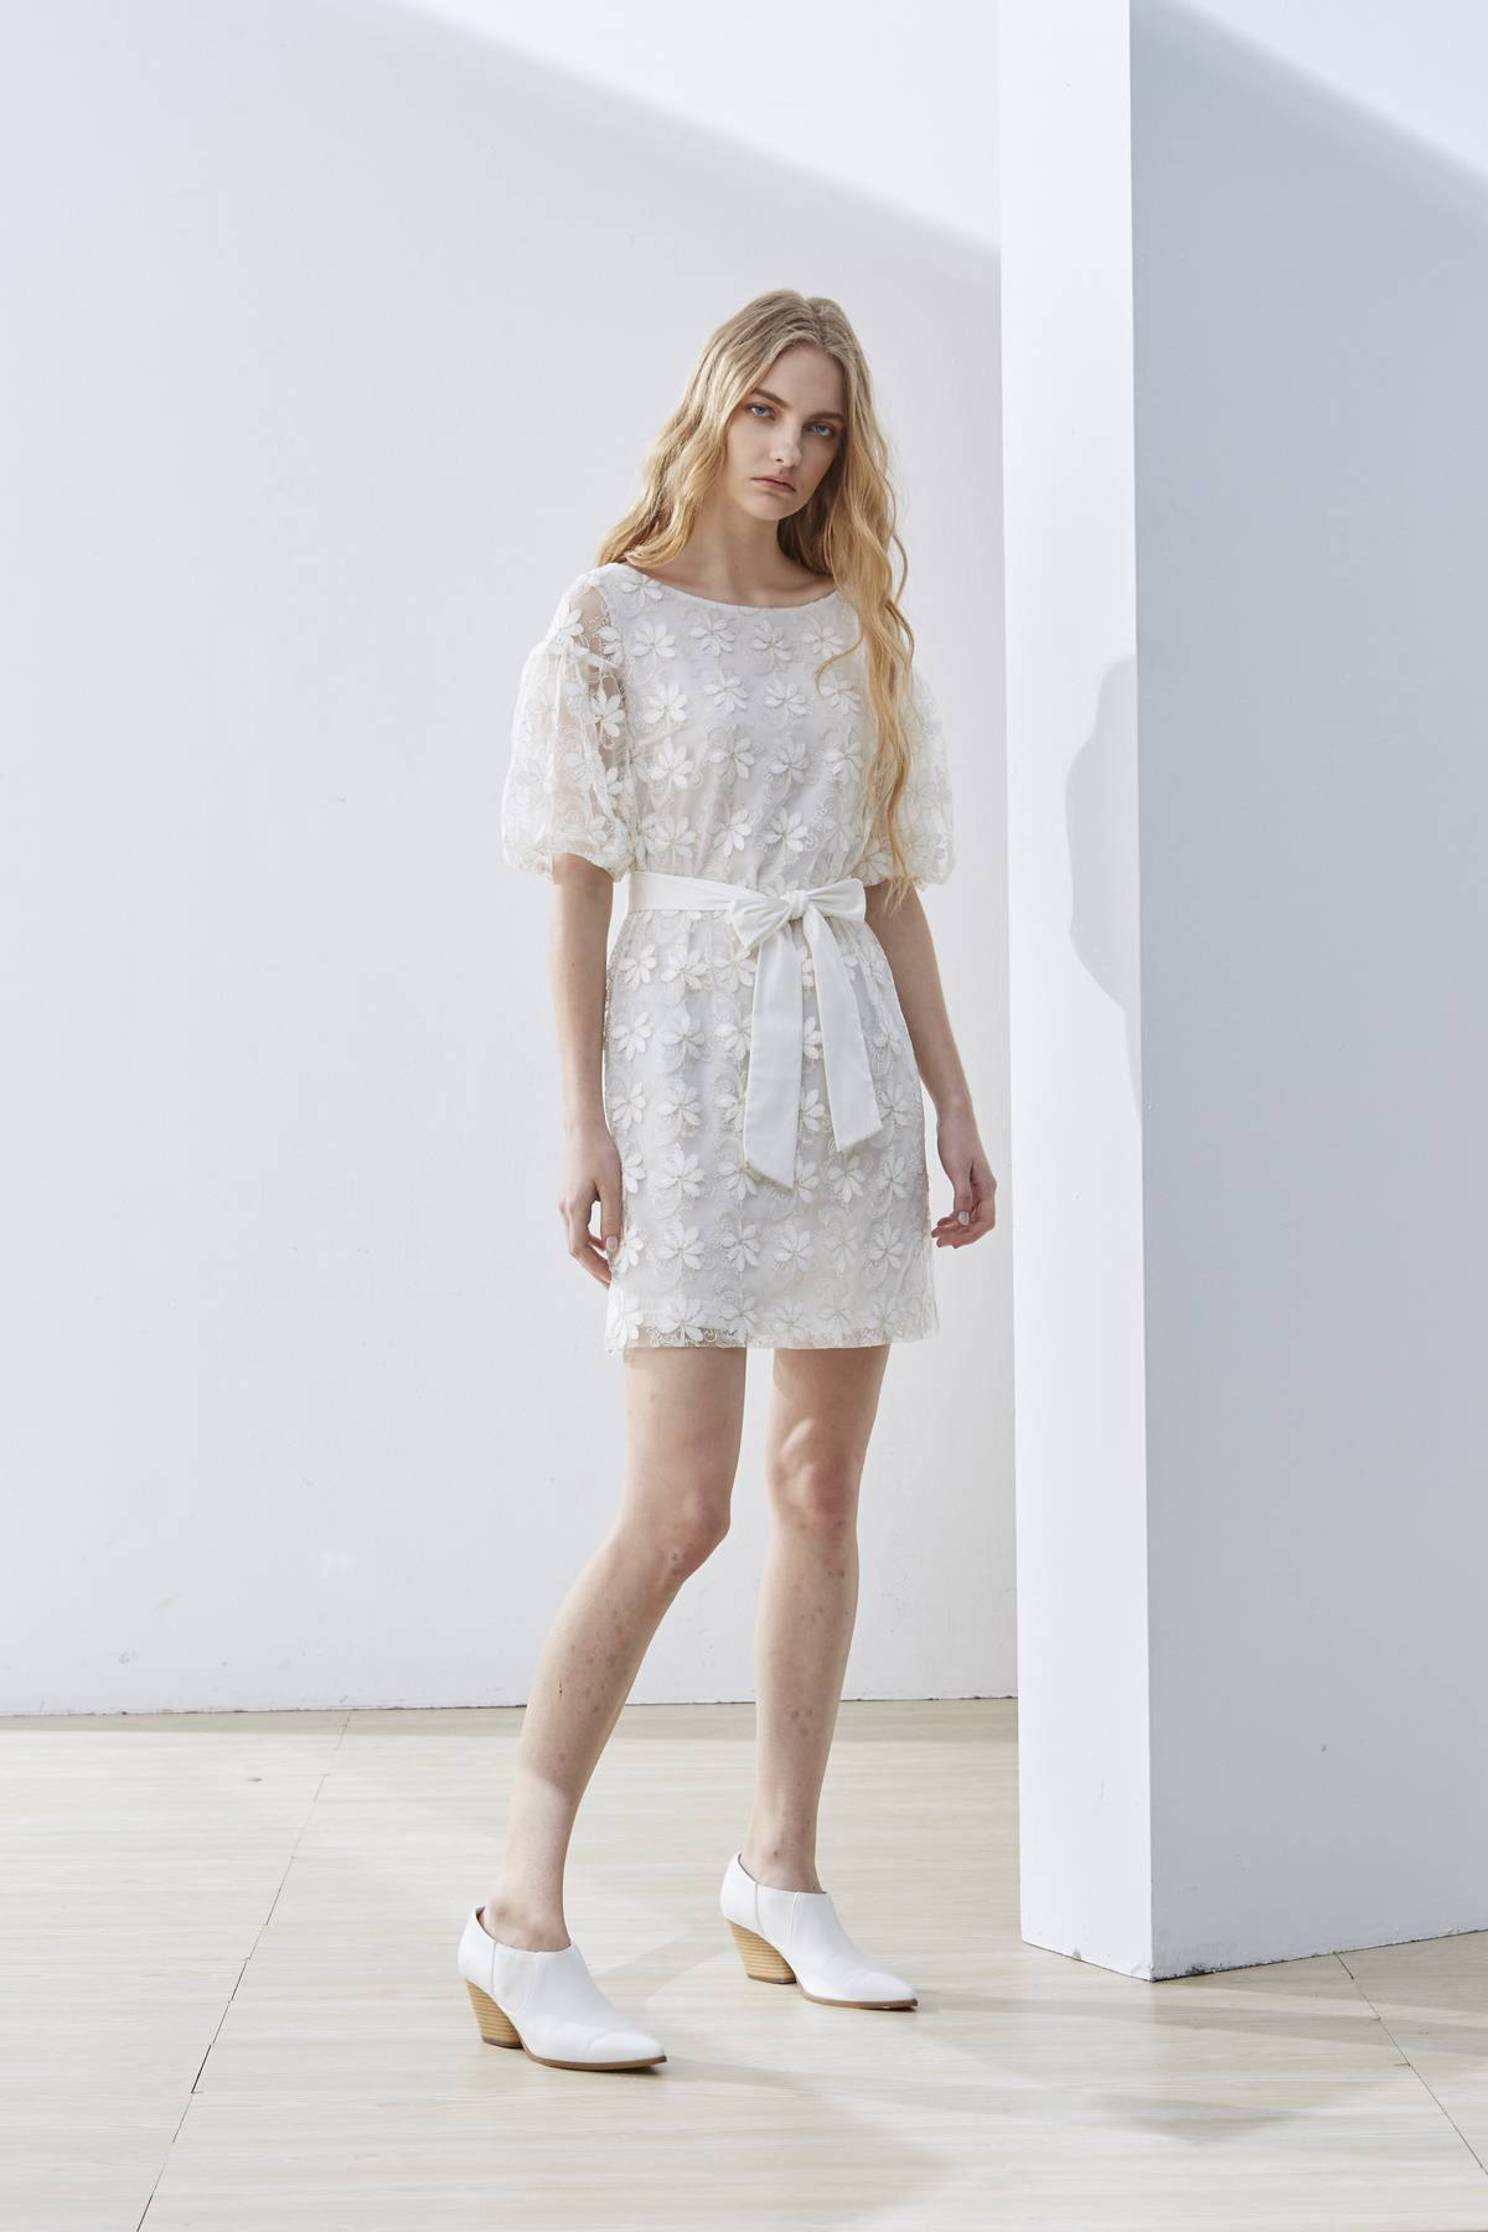 Temperament straps women's fashion dress